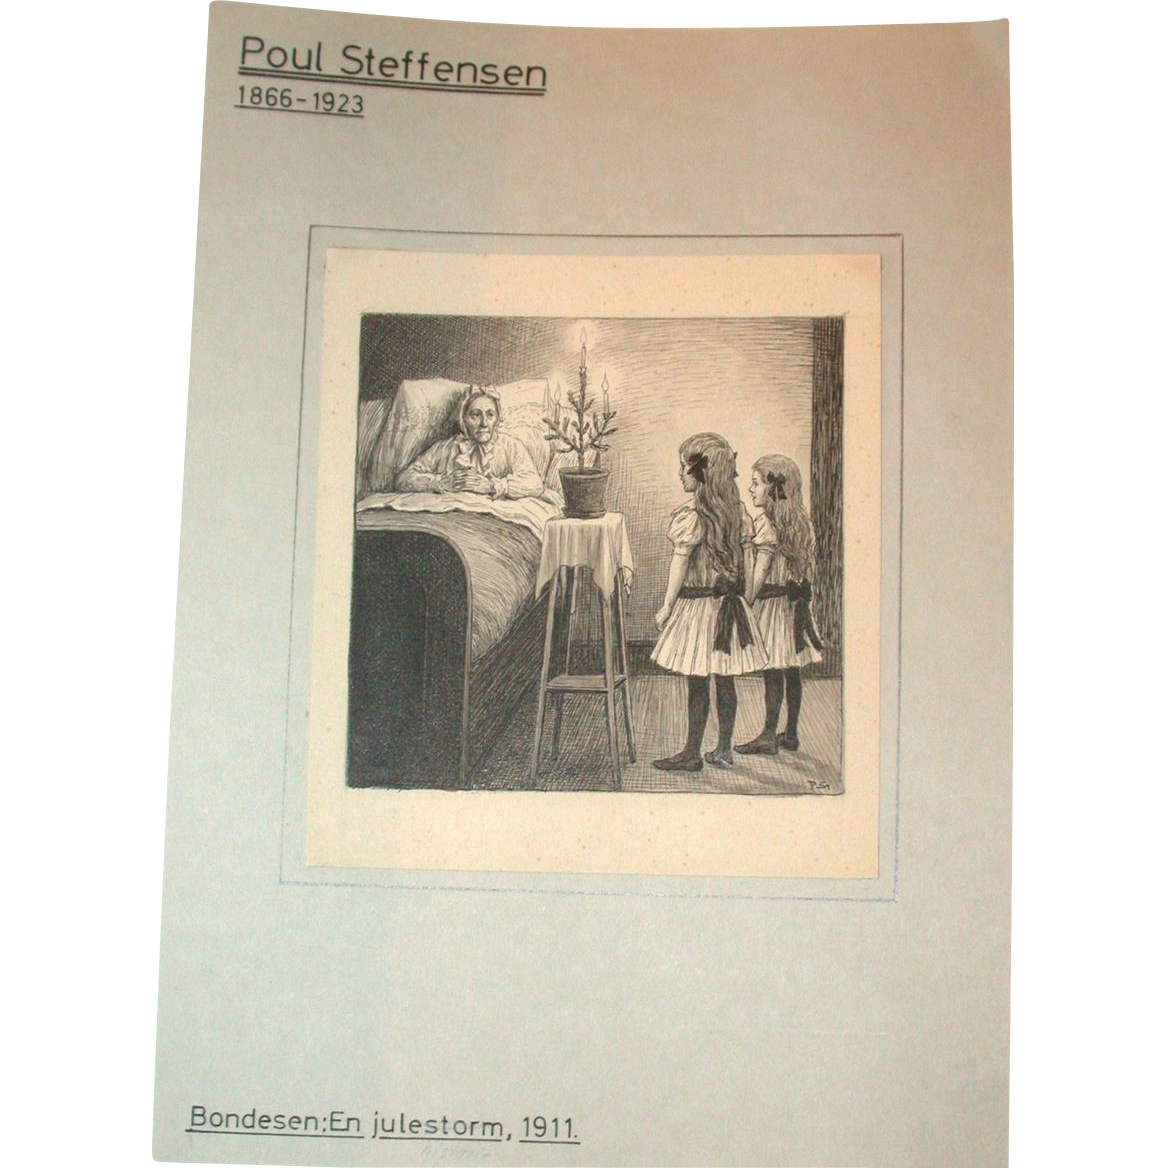 Poul Steffensen (1866-1923) - Original Antique Pencil, Pen and Watercolor Drawing on Paper, Circa 1911